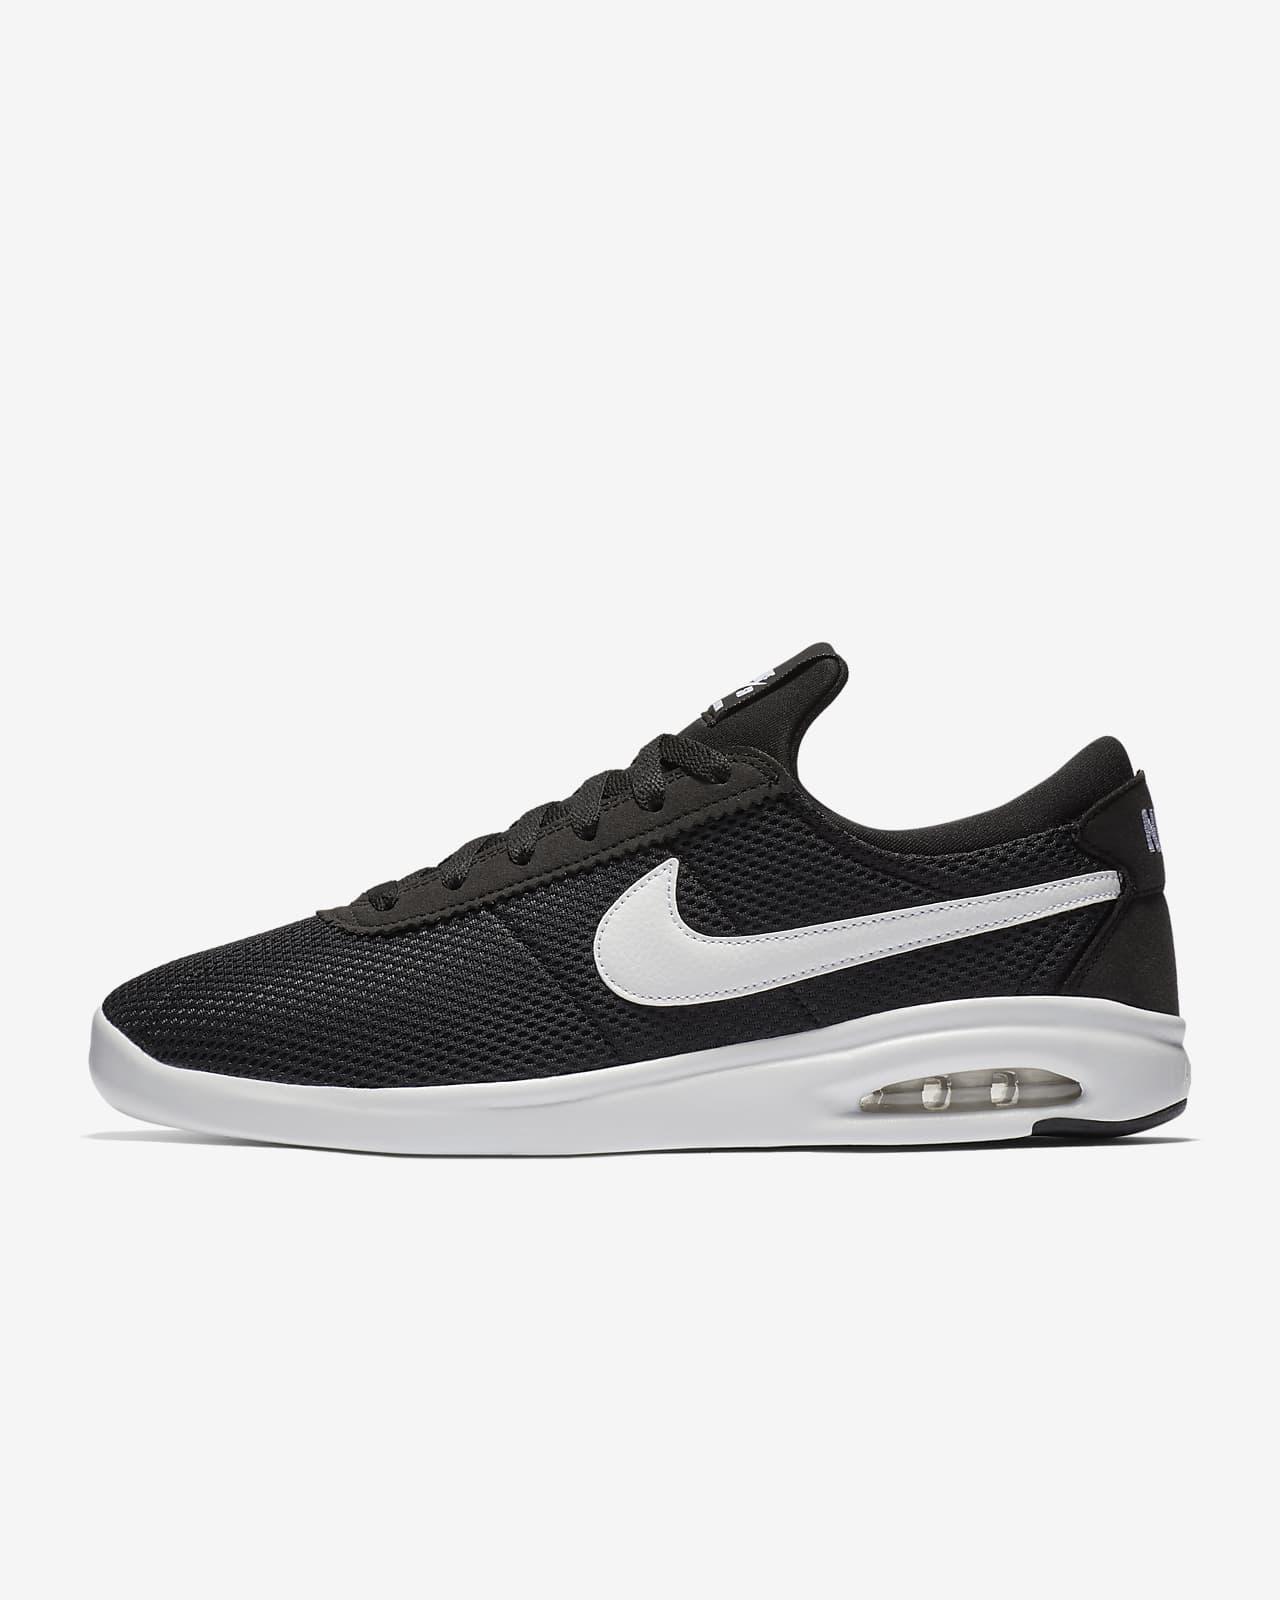 Electrónico Persona a cargo del juego deportivo Absay  Nike SB Air Max Bruin Vapor Men's Skate Shoe. Nike ID